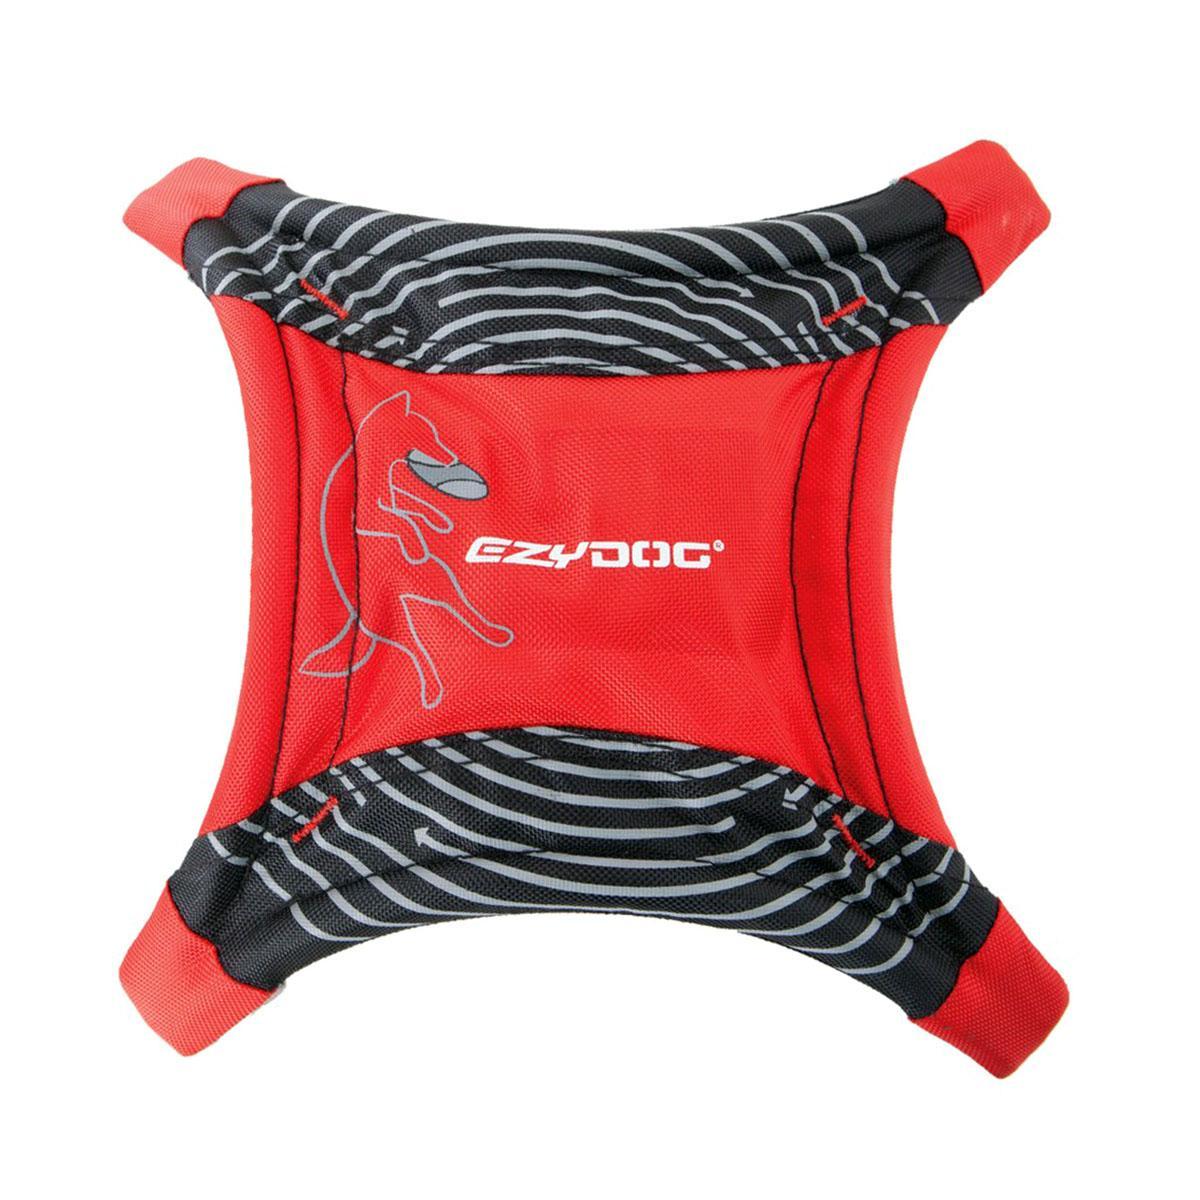 EzyDog Dogstar Flyer Dog Toy - Red